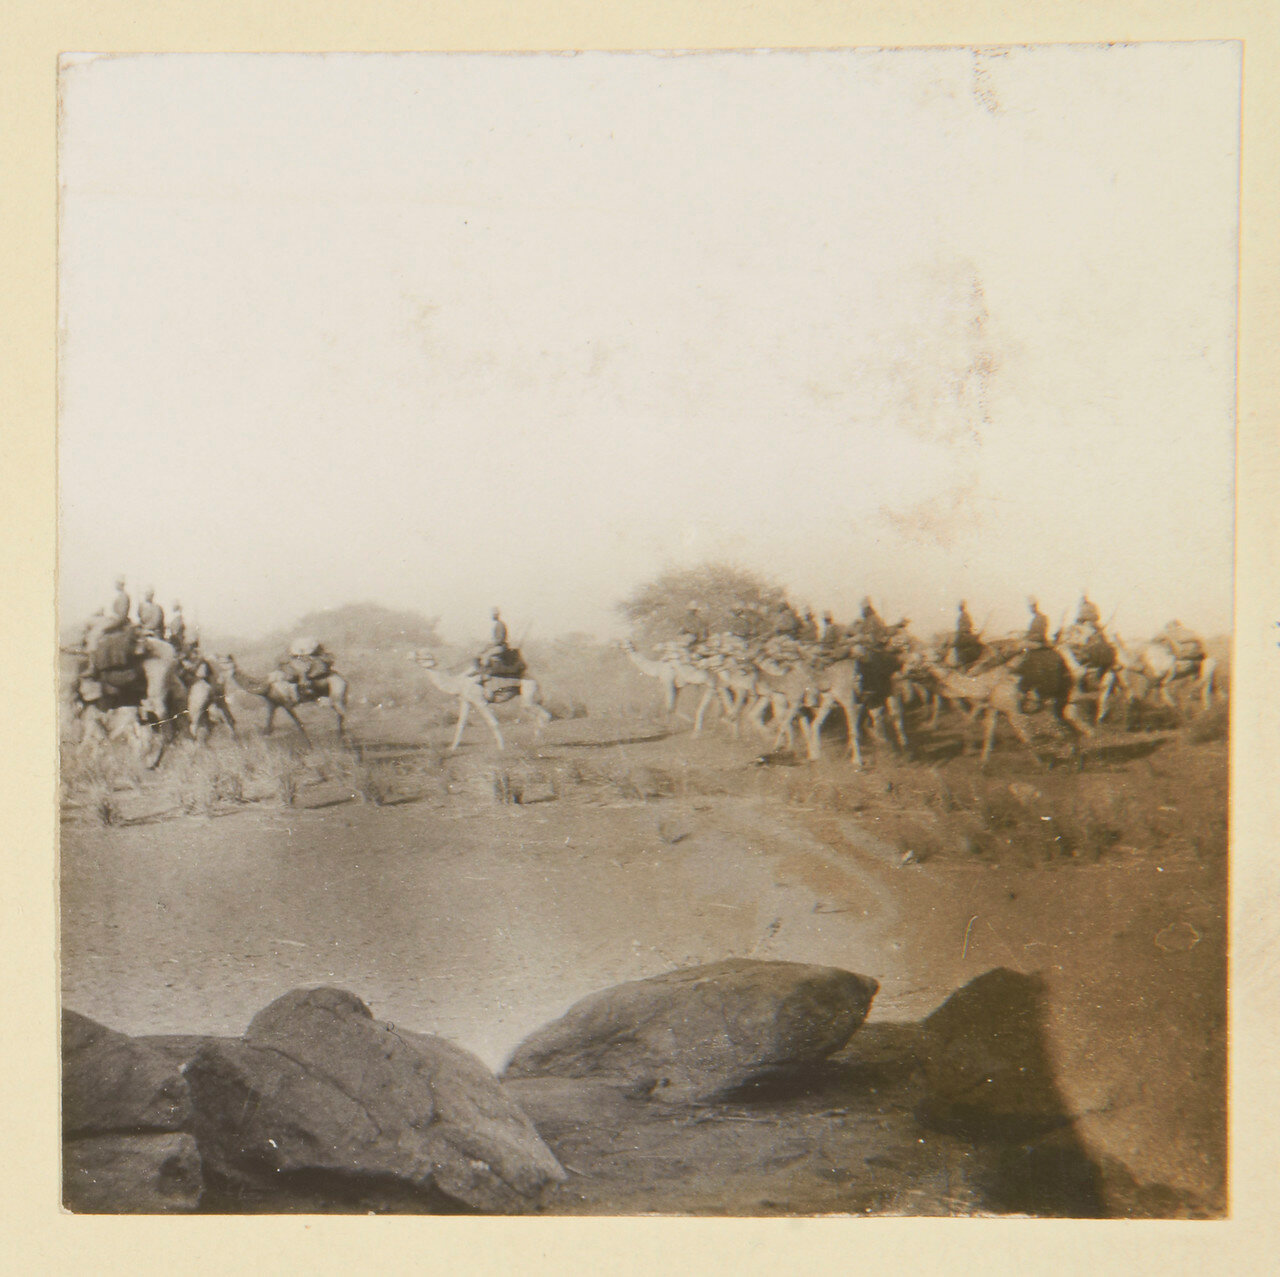 Август 1898. Египетский Верблюжий корпус